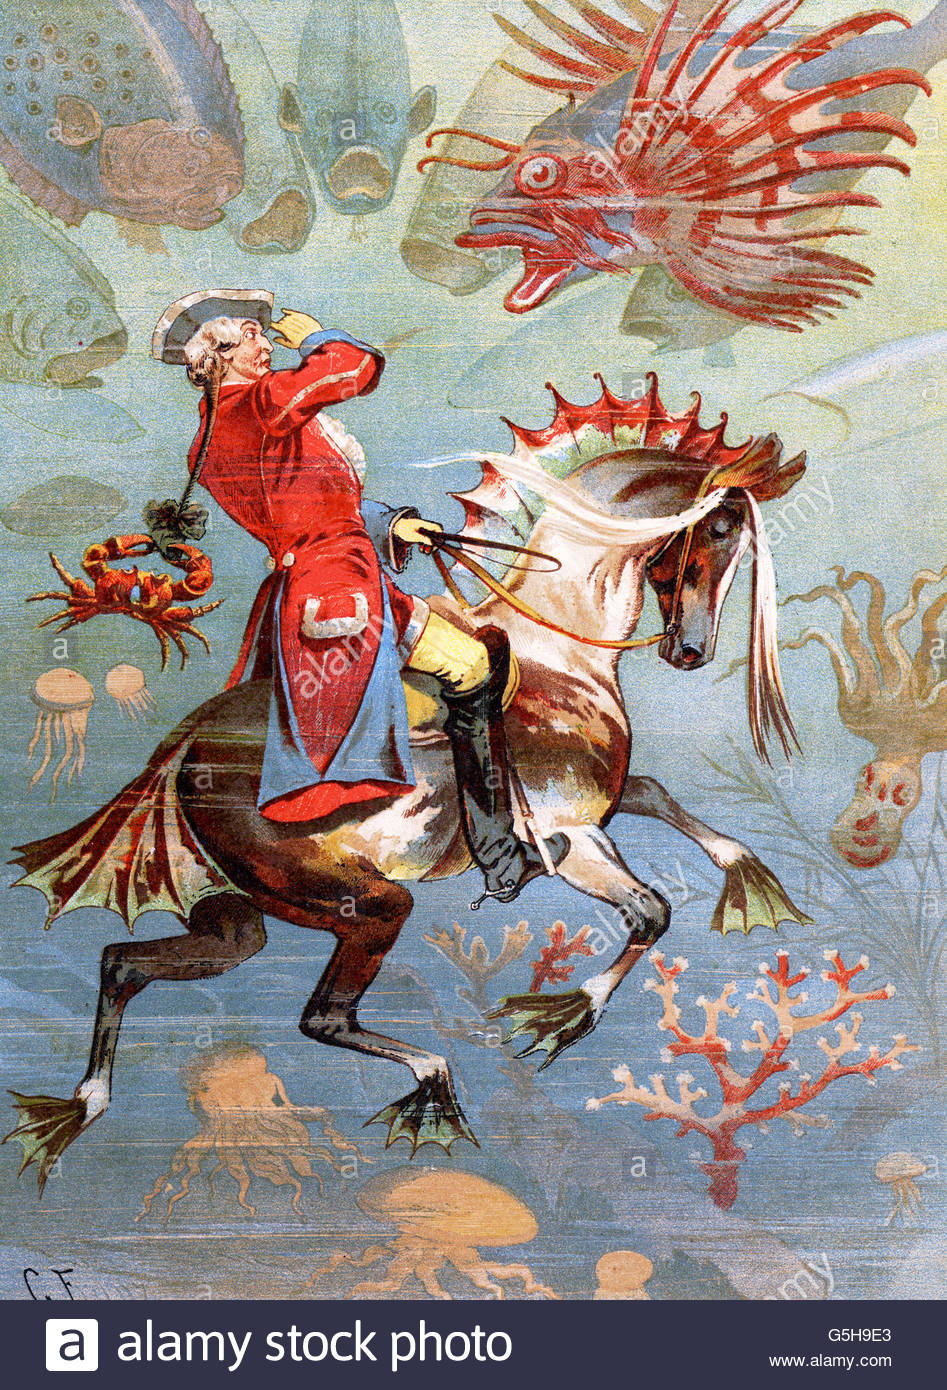 Muenchhausen, Karl Friedrich Hieronymus von, 11.5.1720 - 22.2.1797, funzionario tedesco, le avventure, equitazione Foto Stock